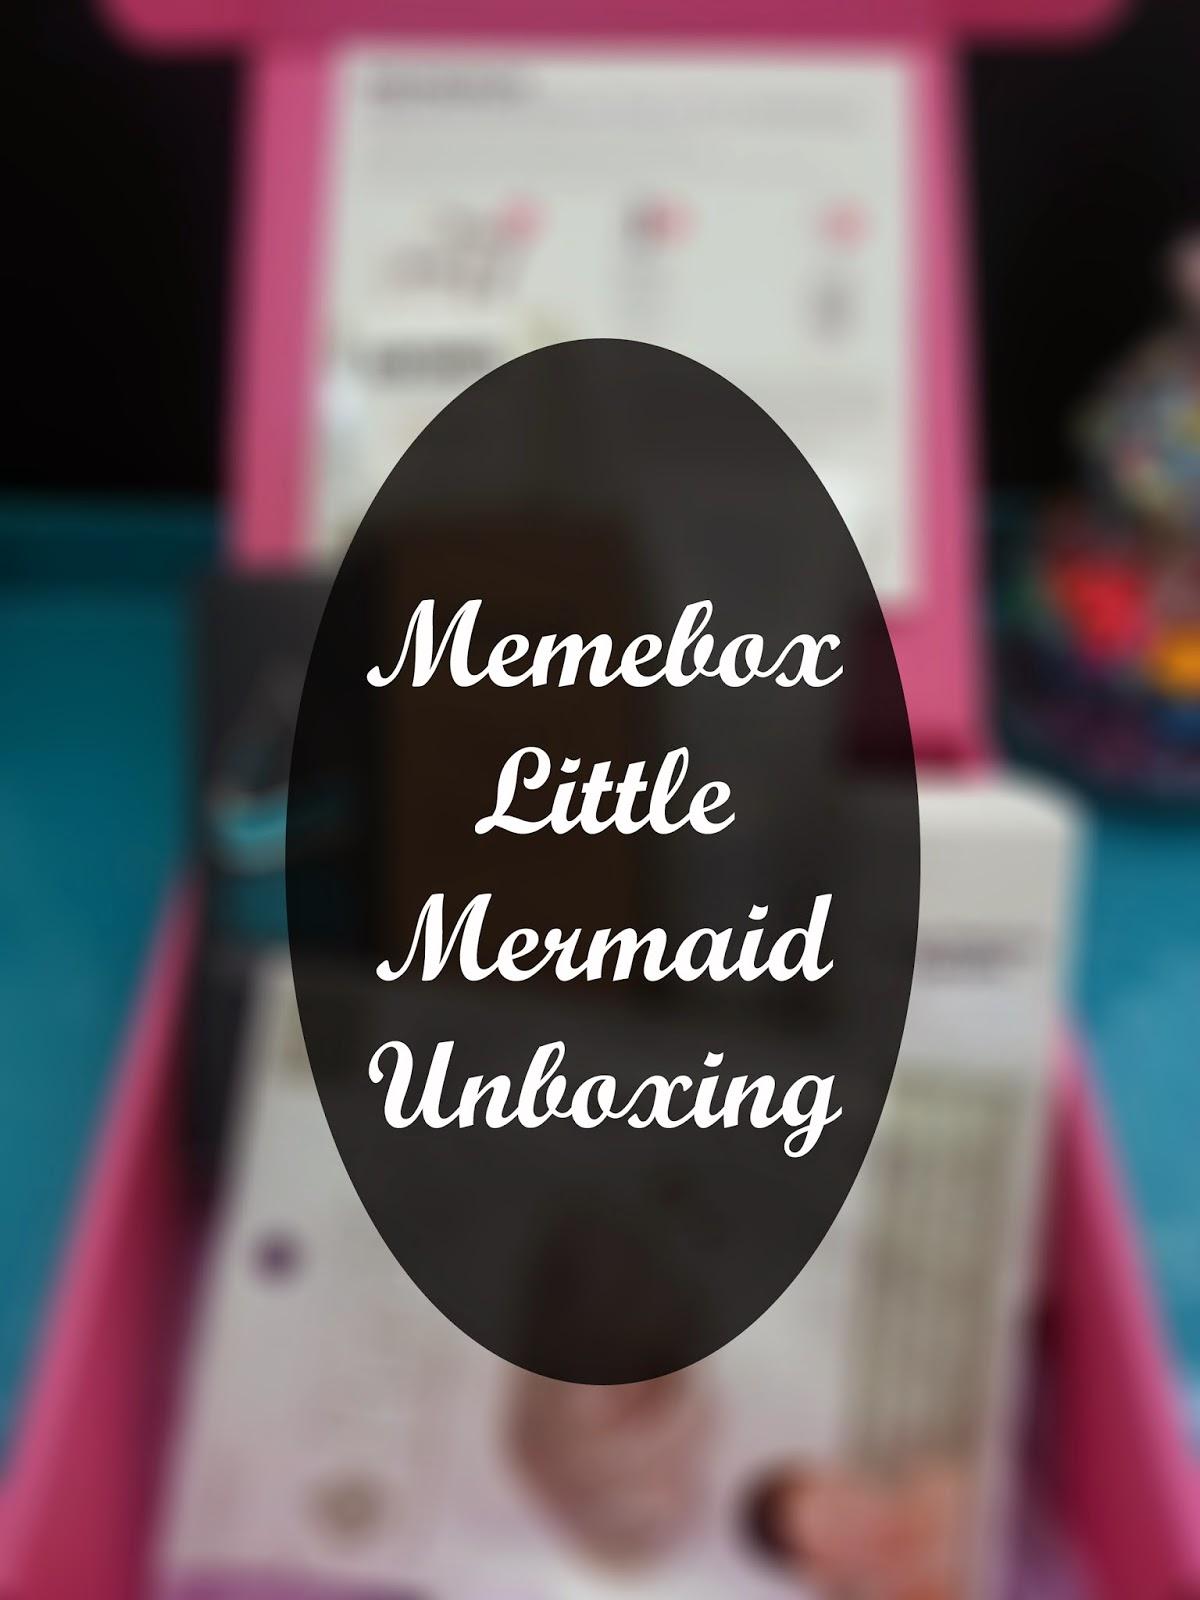 Unboxing: Memebox The Little Mermaid